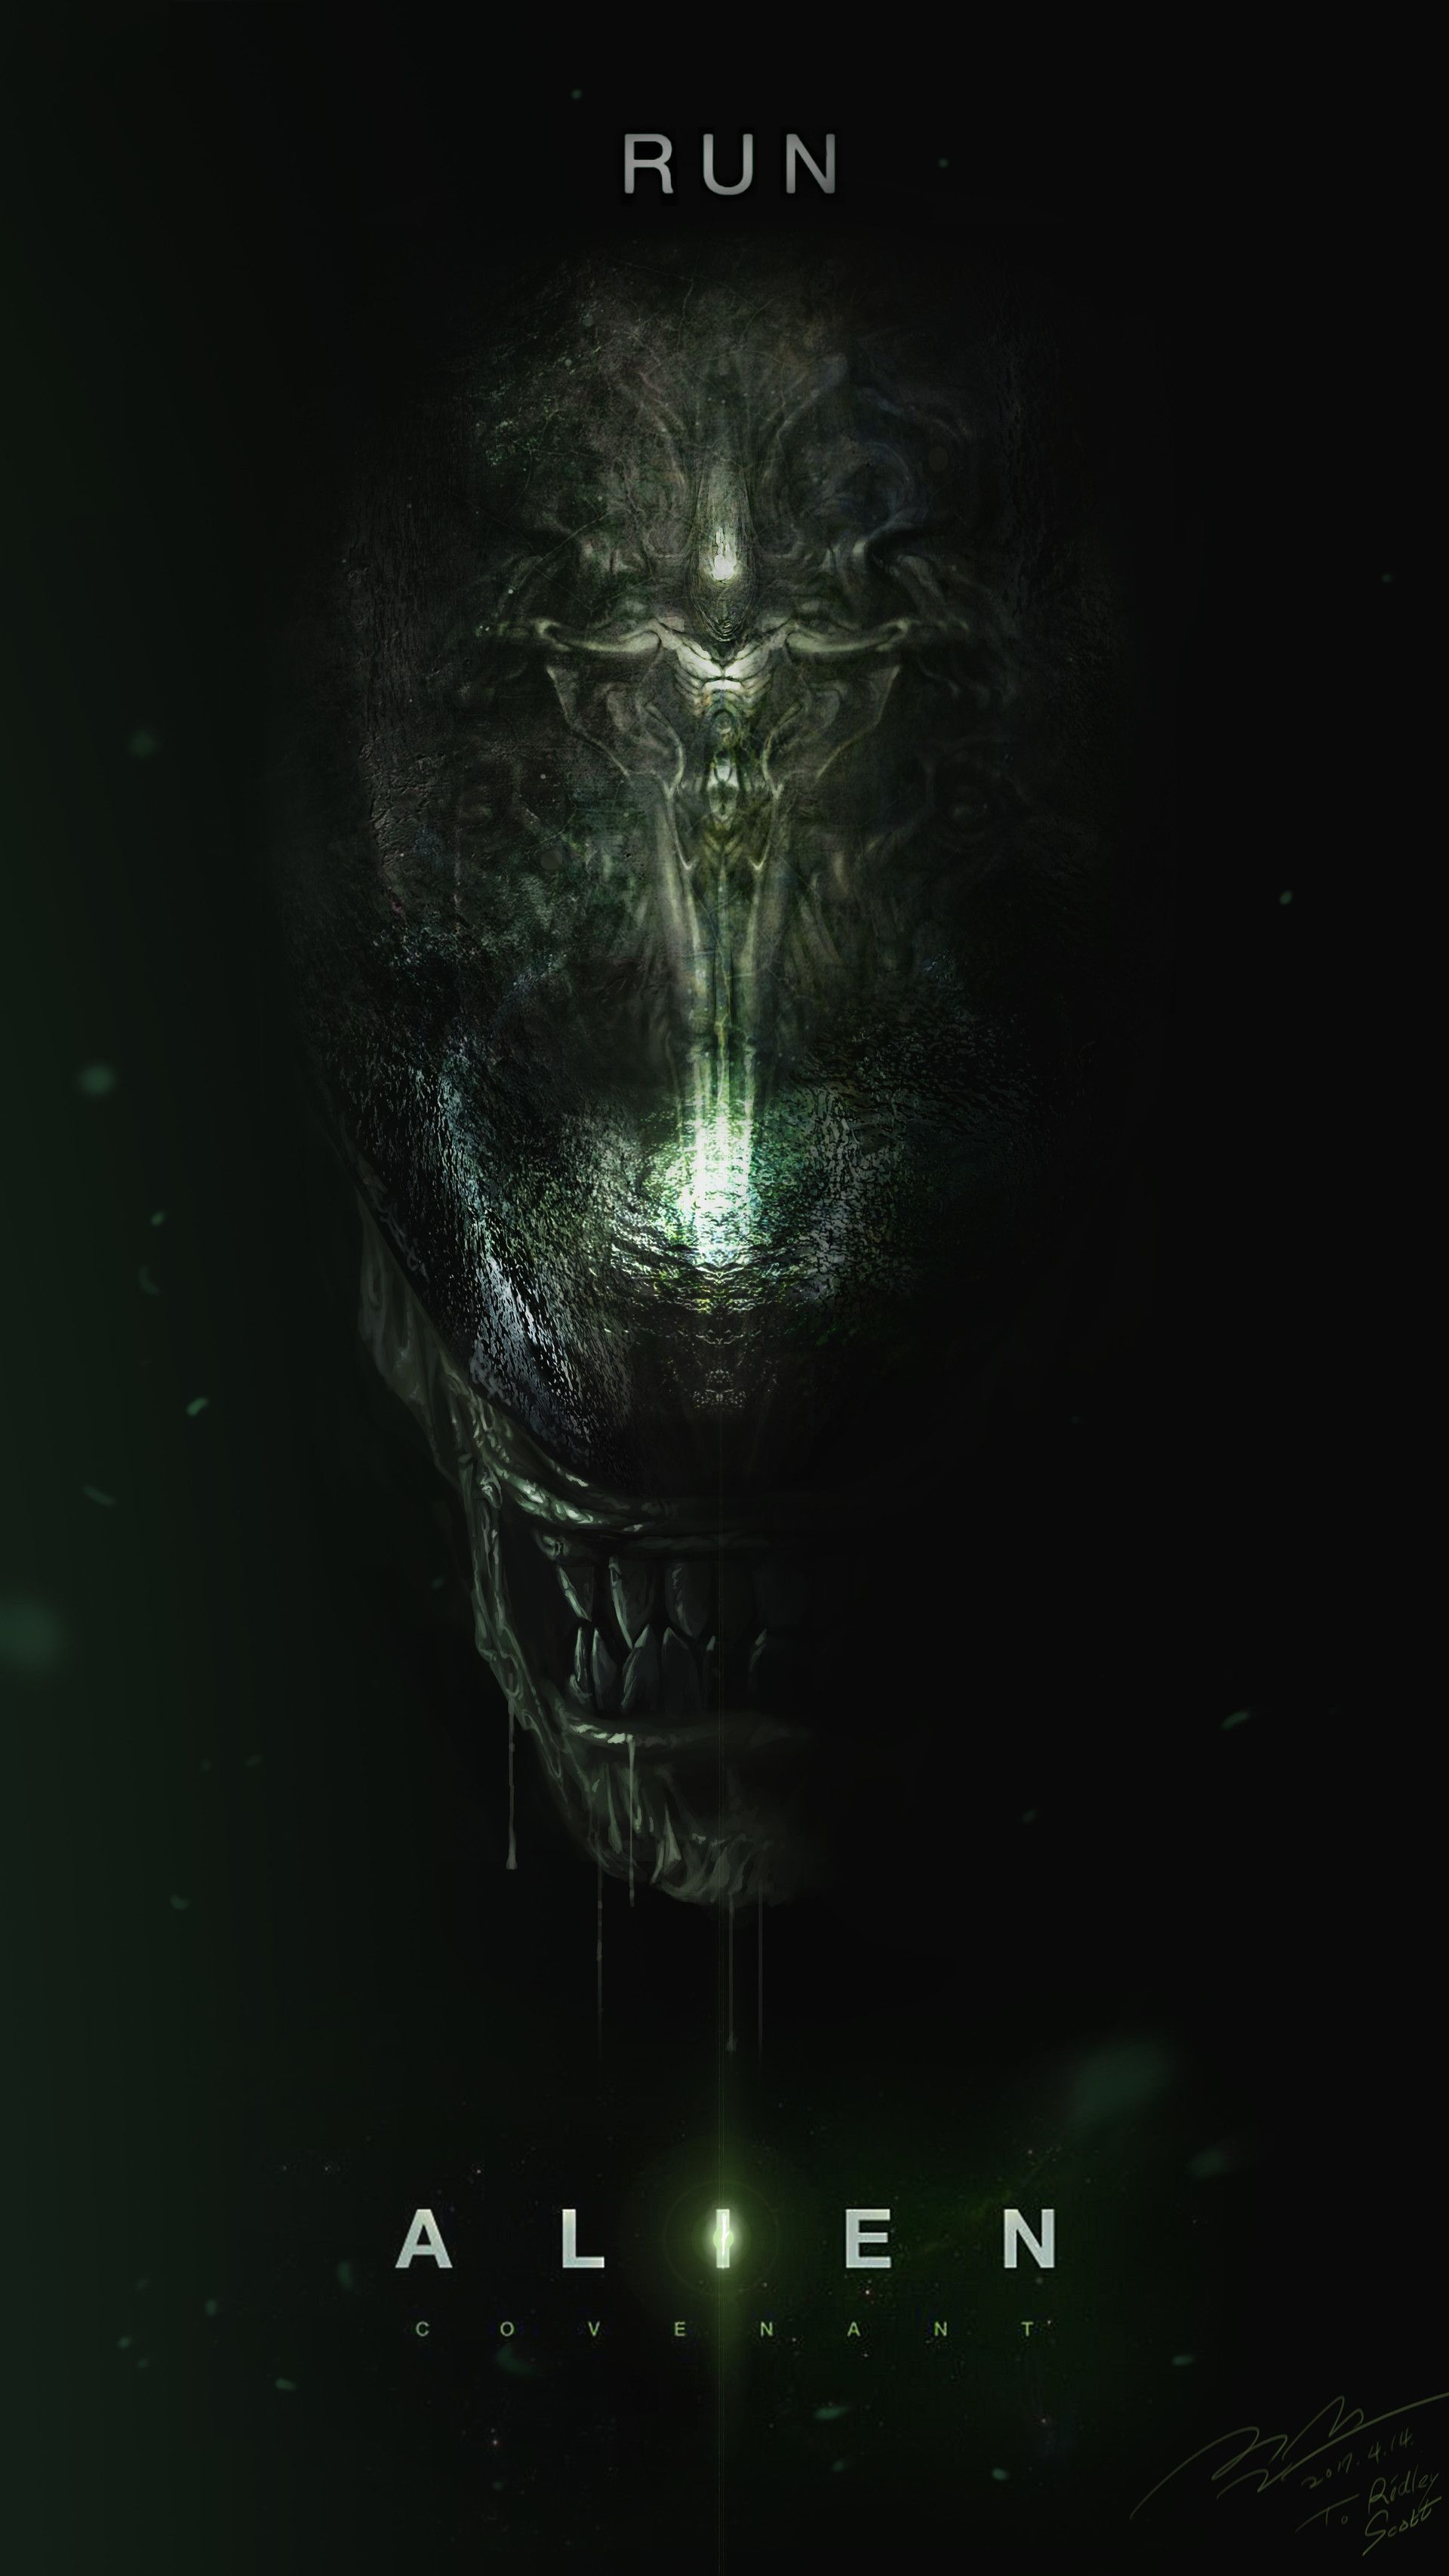 "ArtStation - ""Run"" - Alien Covenant Fan art Poster, Jun Seong Park | Alien artwork, Alien movie poster, Alien"